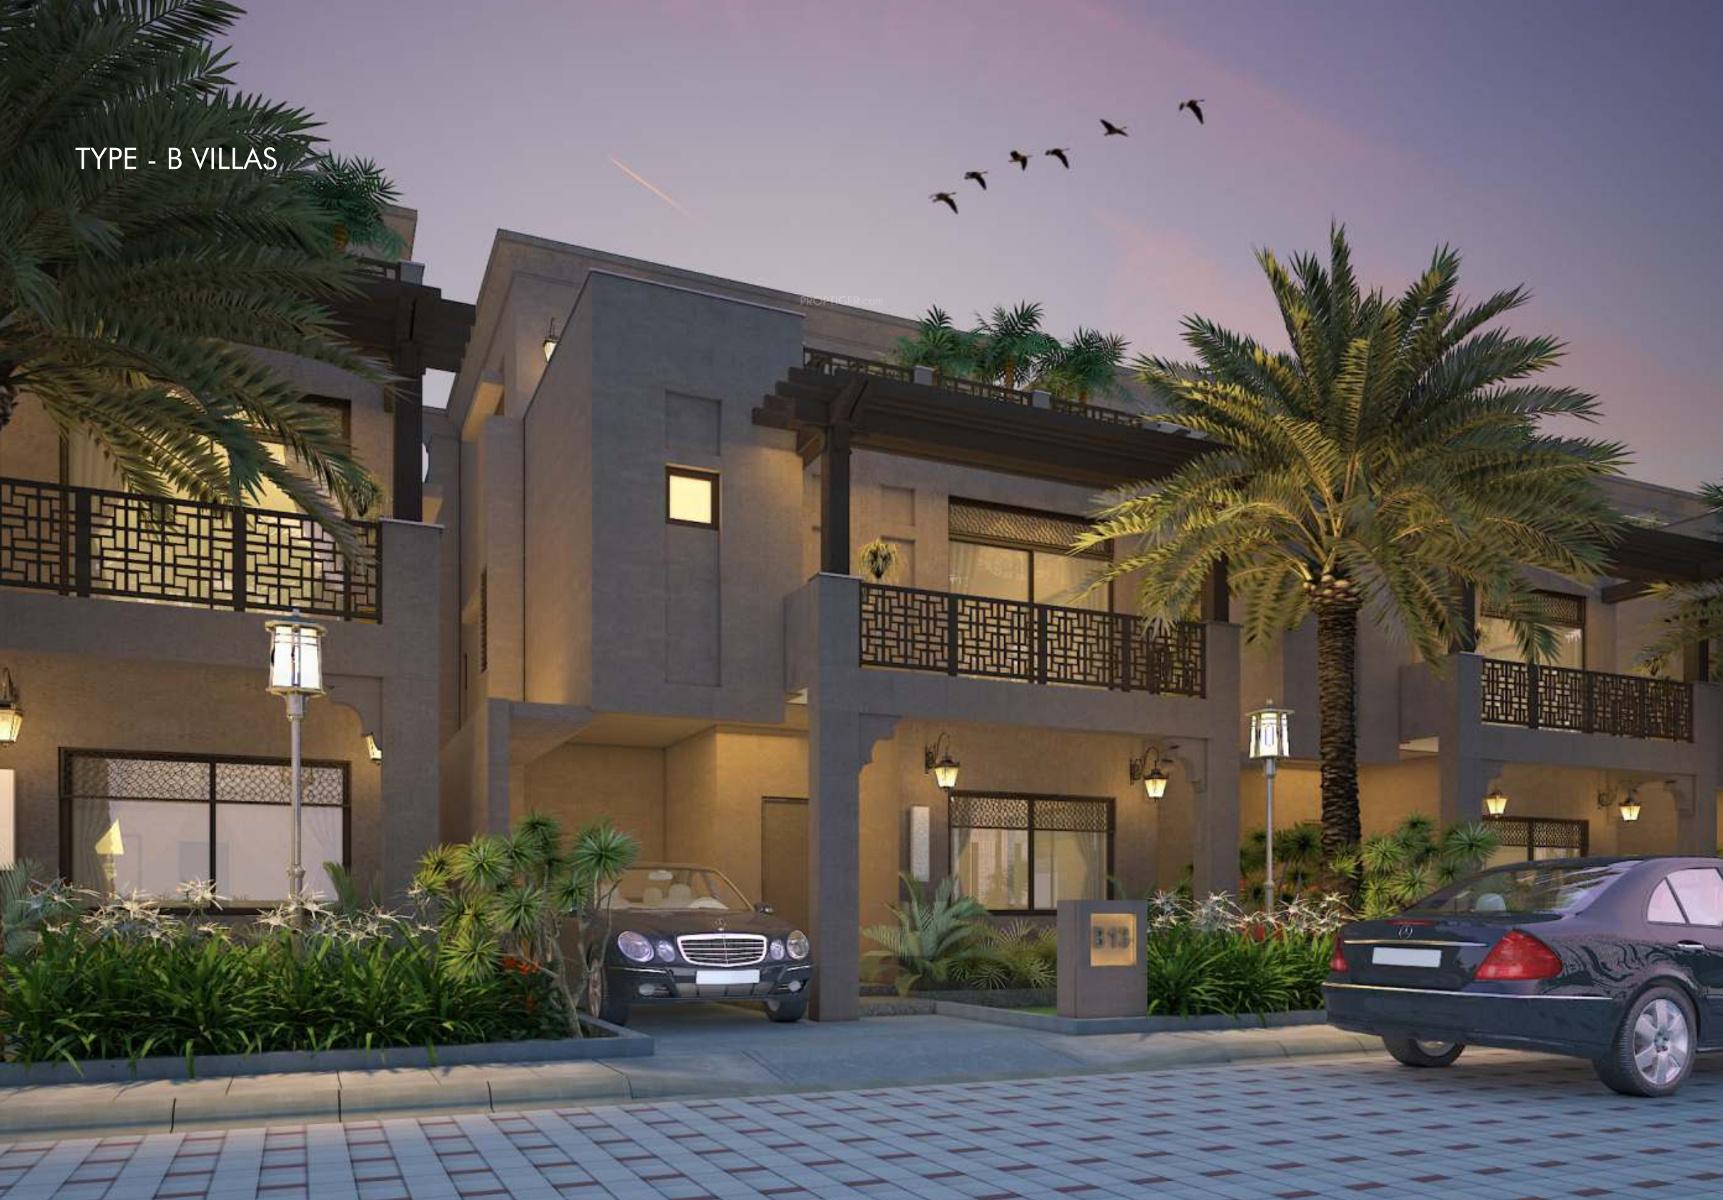 4900 Sq Ft 4 Bhk 5t Villa For Sale In Srk Infra The